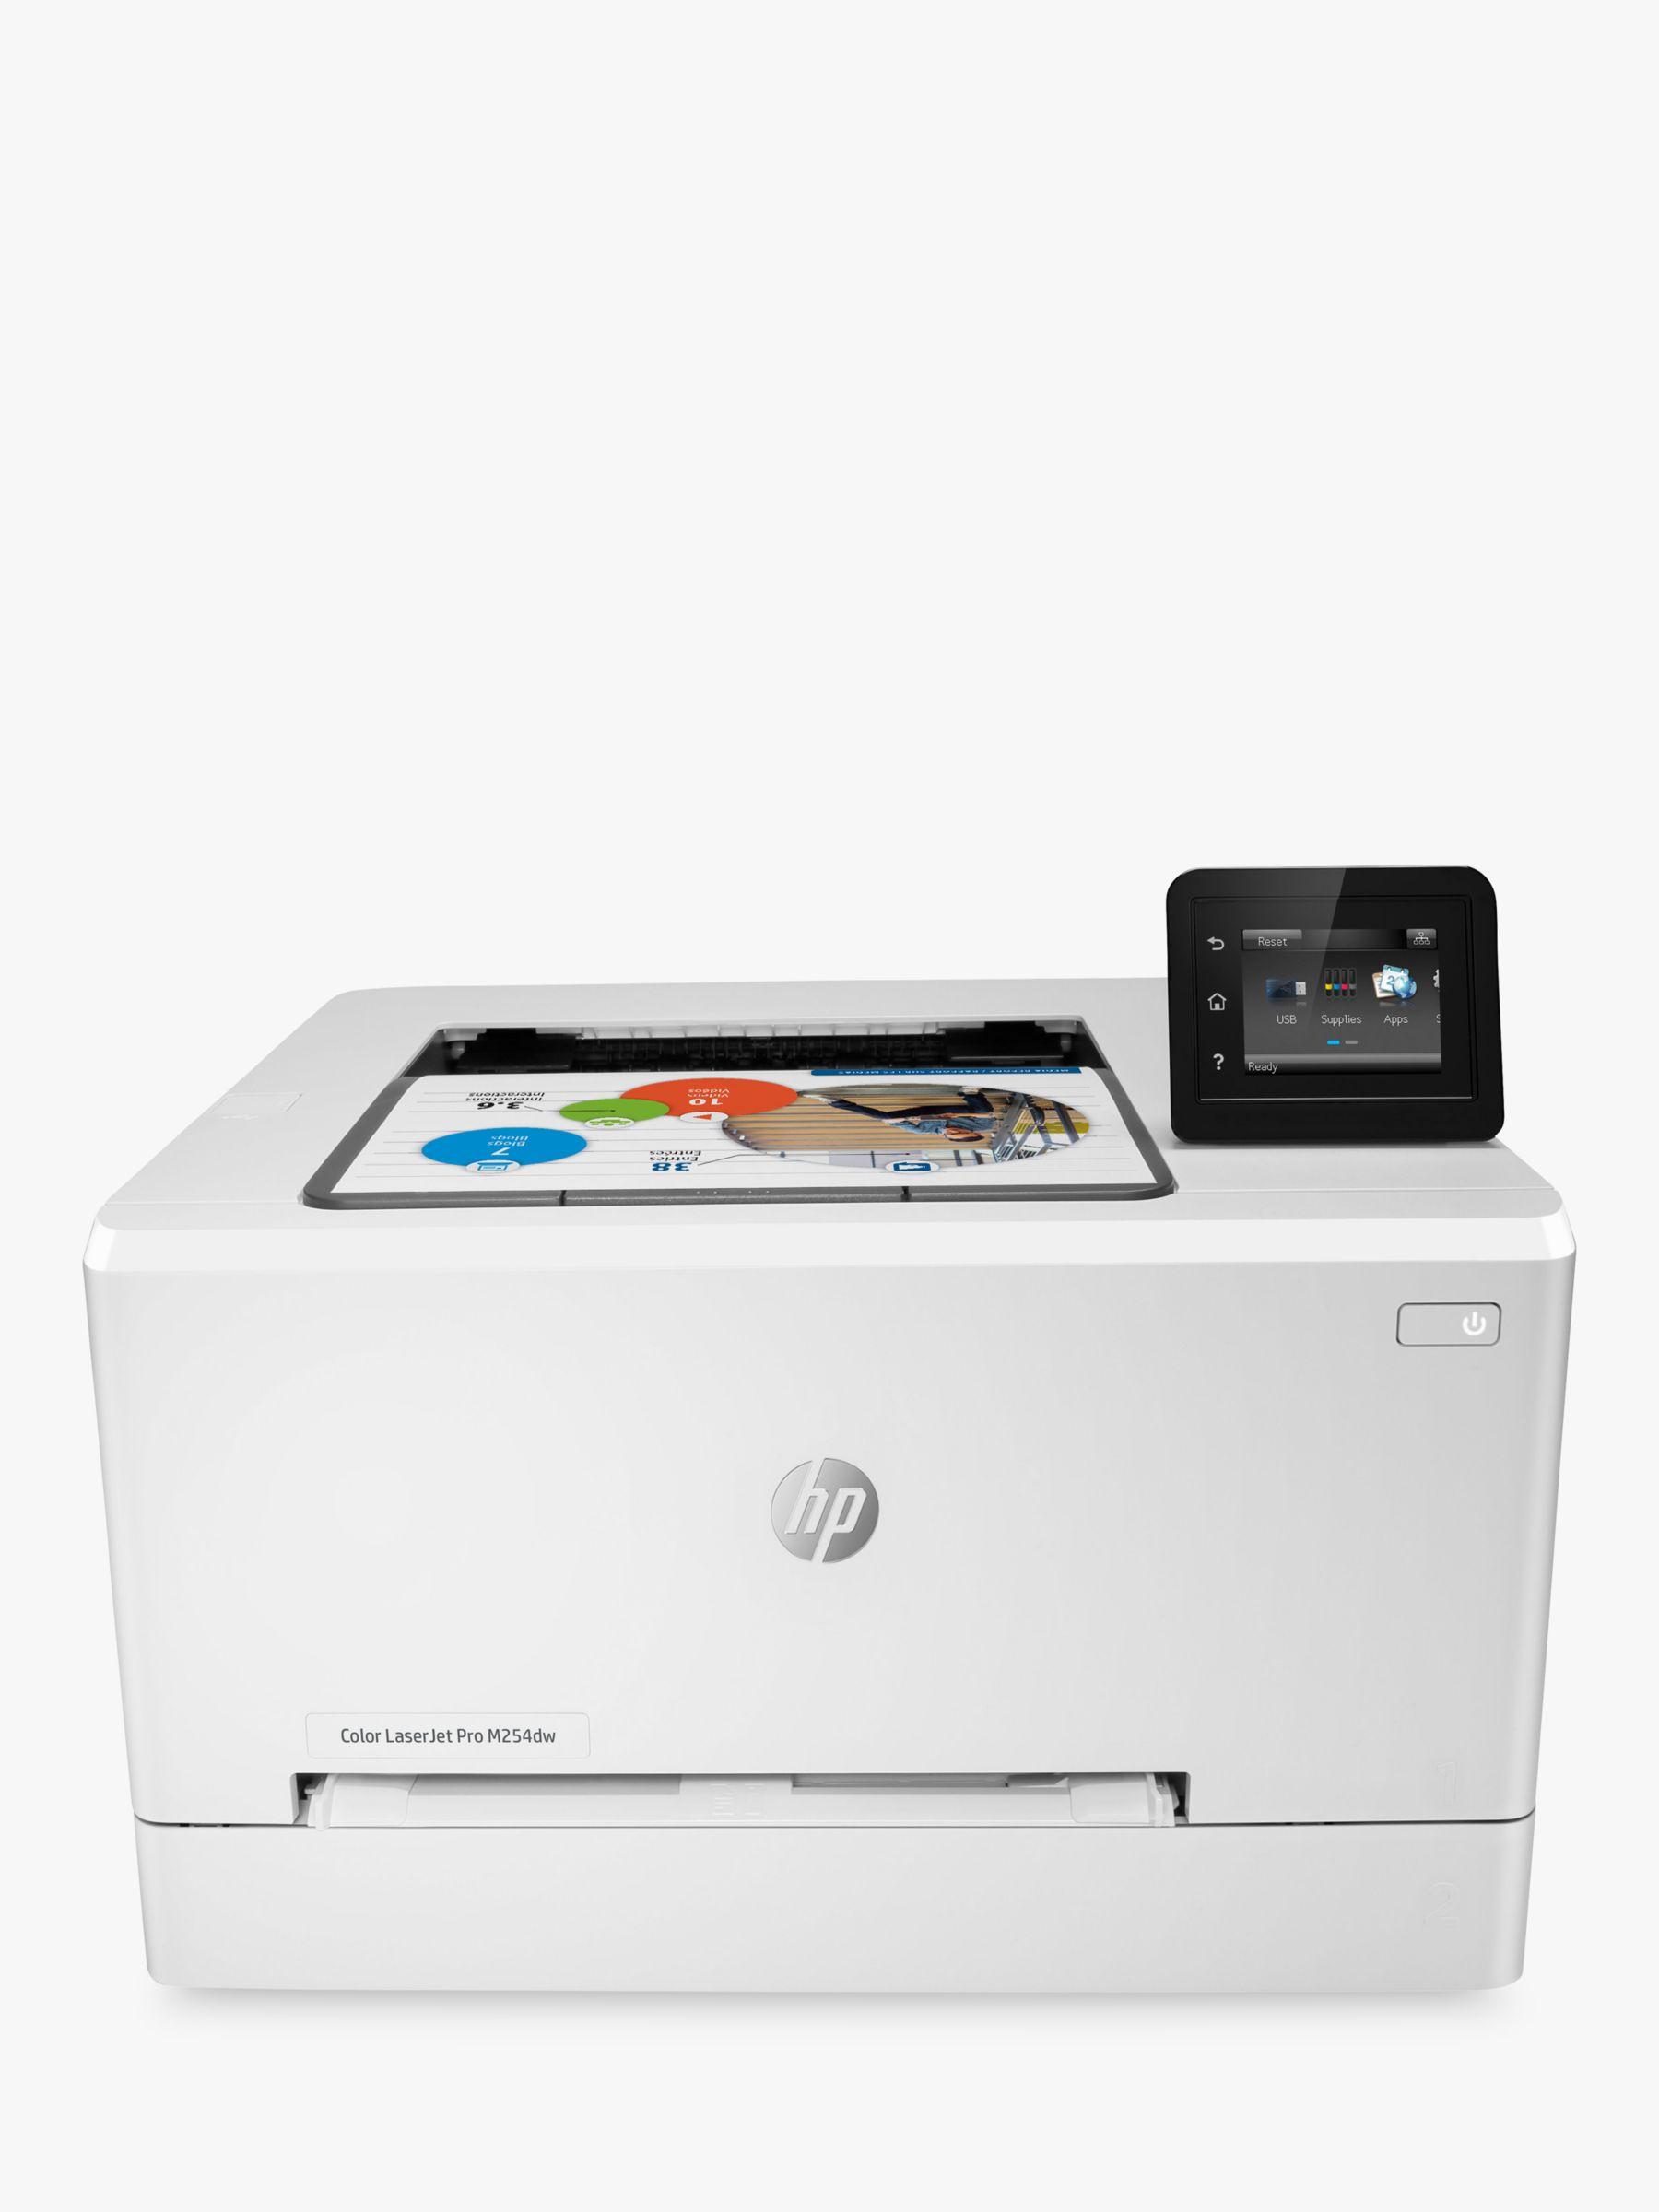 HP LaserJet Pro M254DW Wireless Colour Printer with Wi-Fi & Instant-On  Technology, White